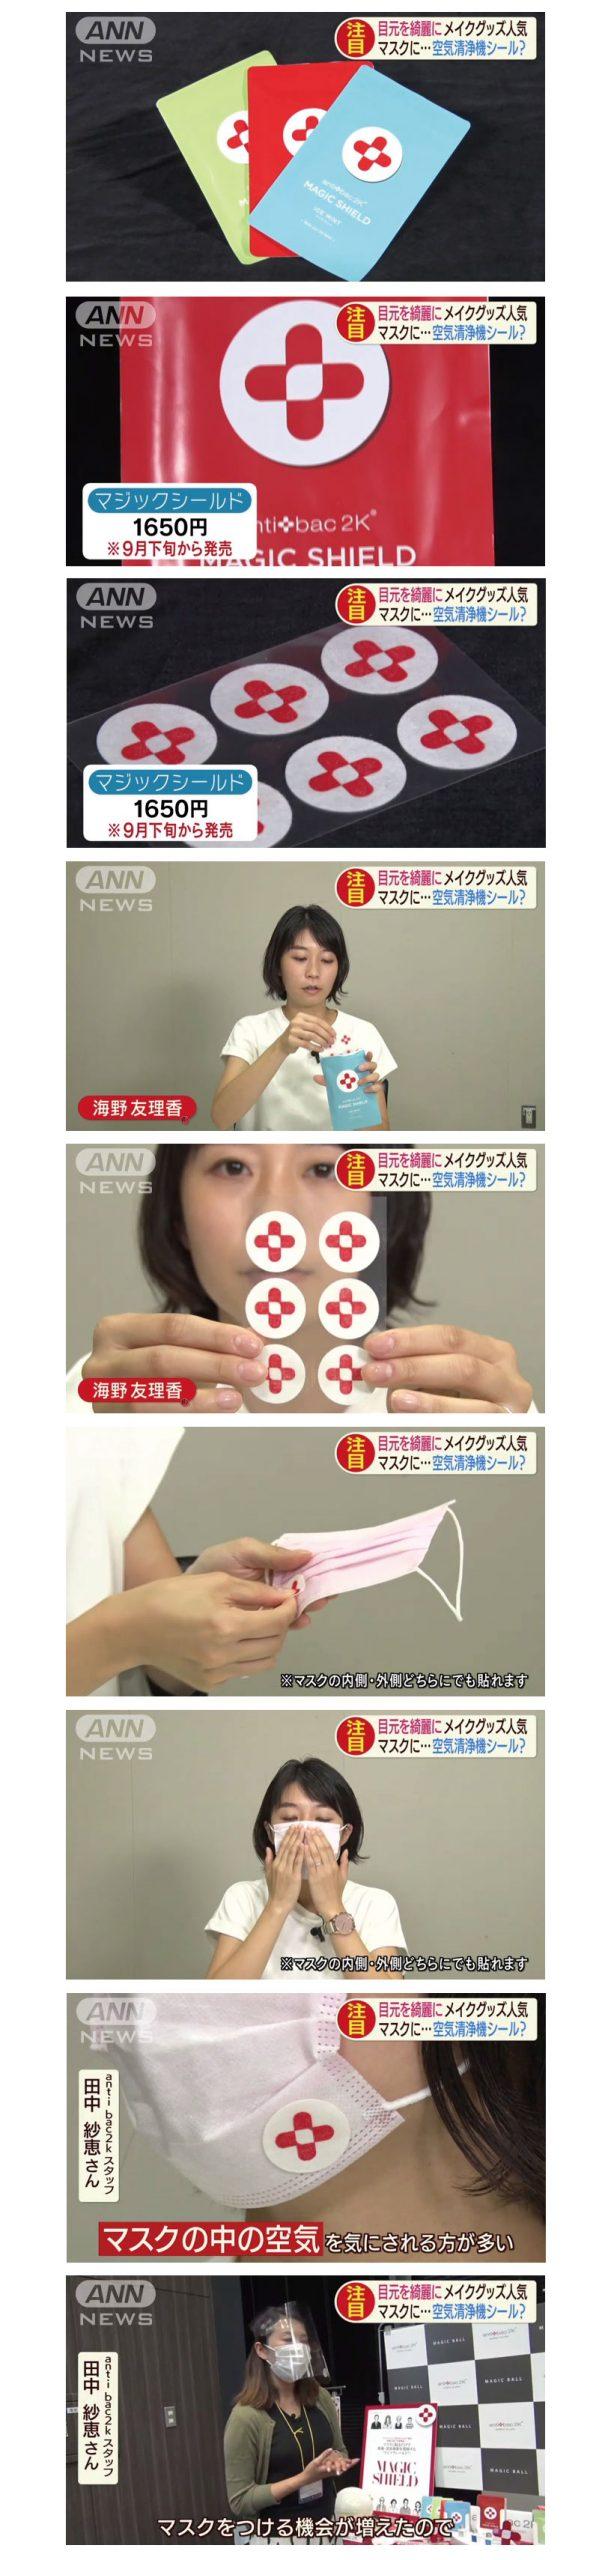 ANN『スーパーJチャンネル』放送